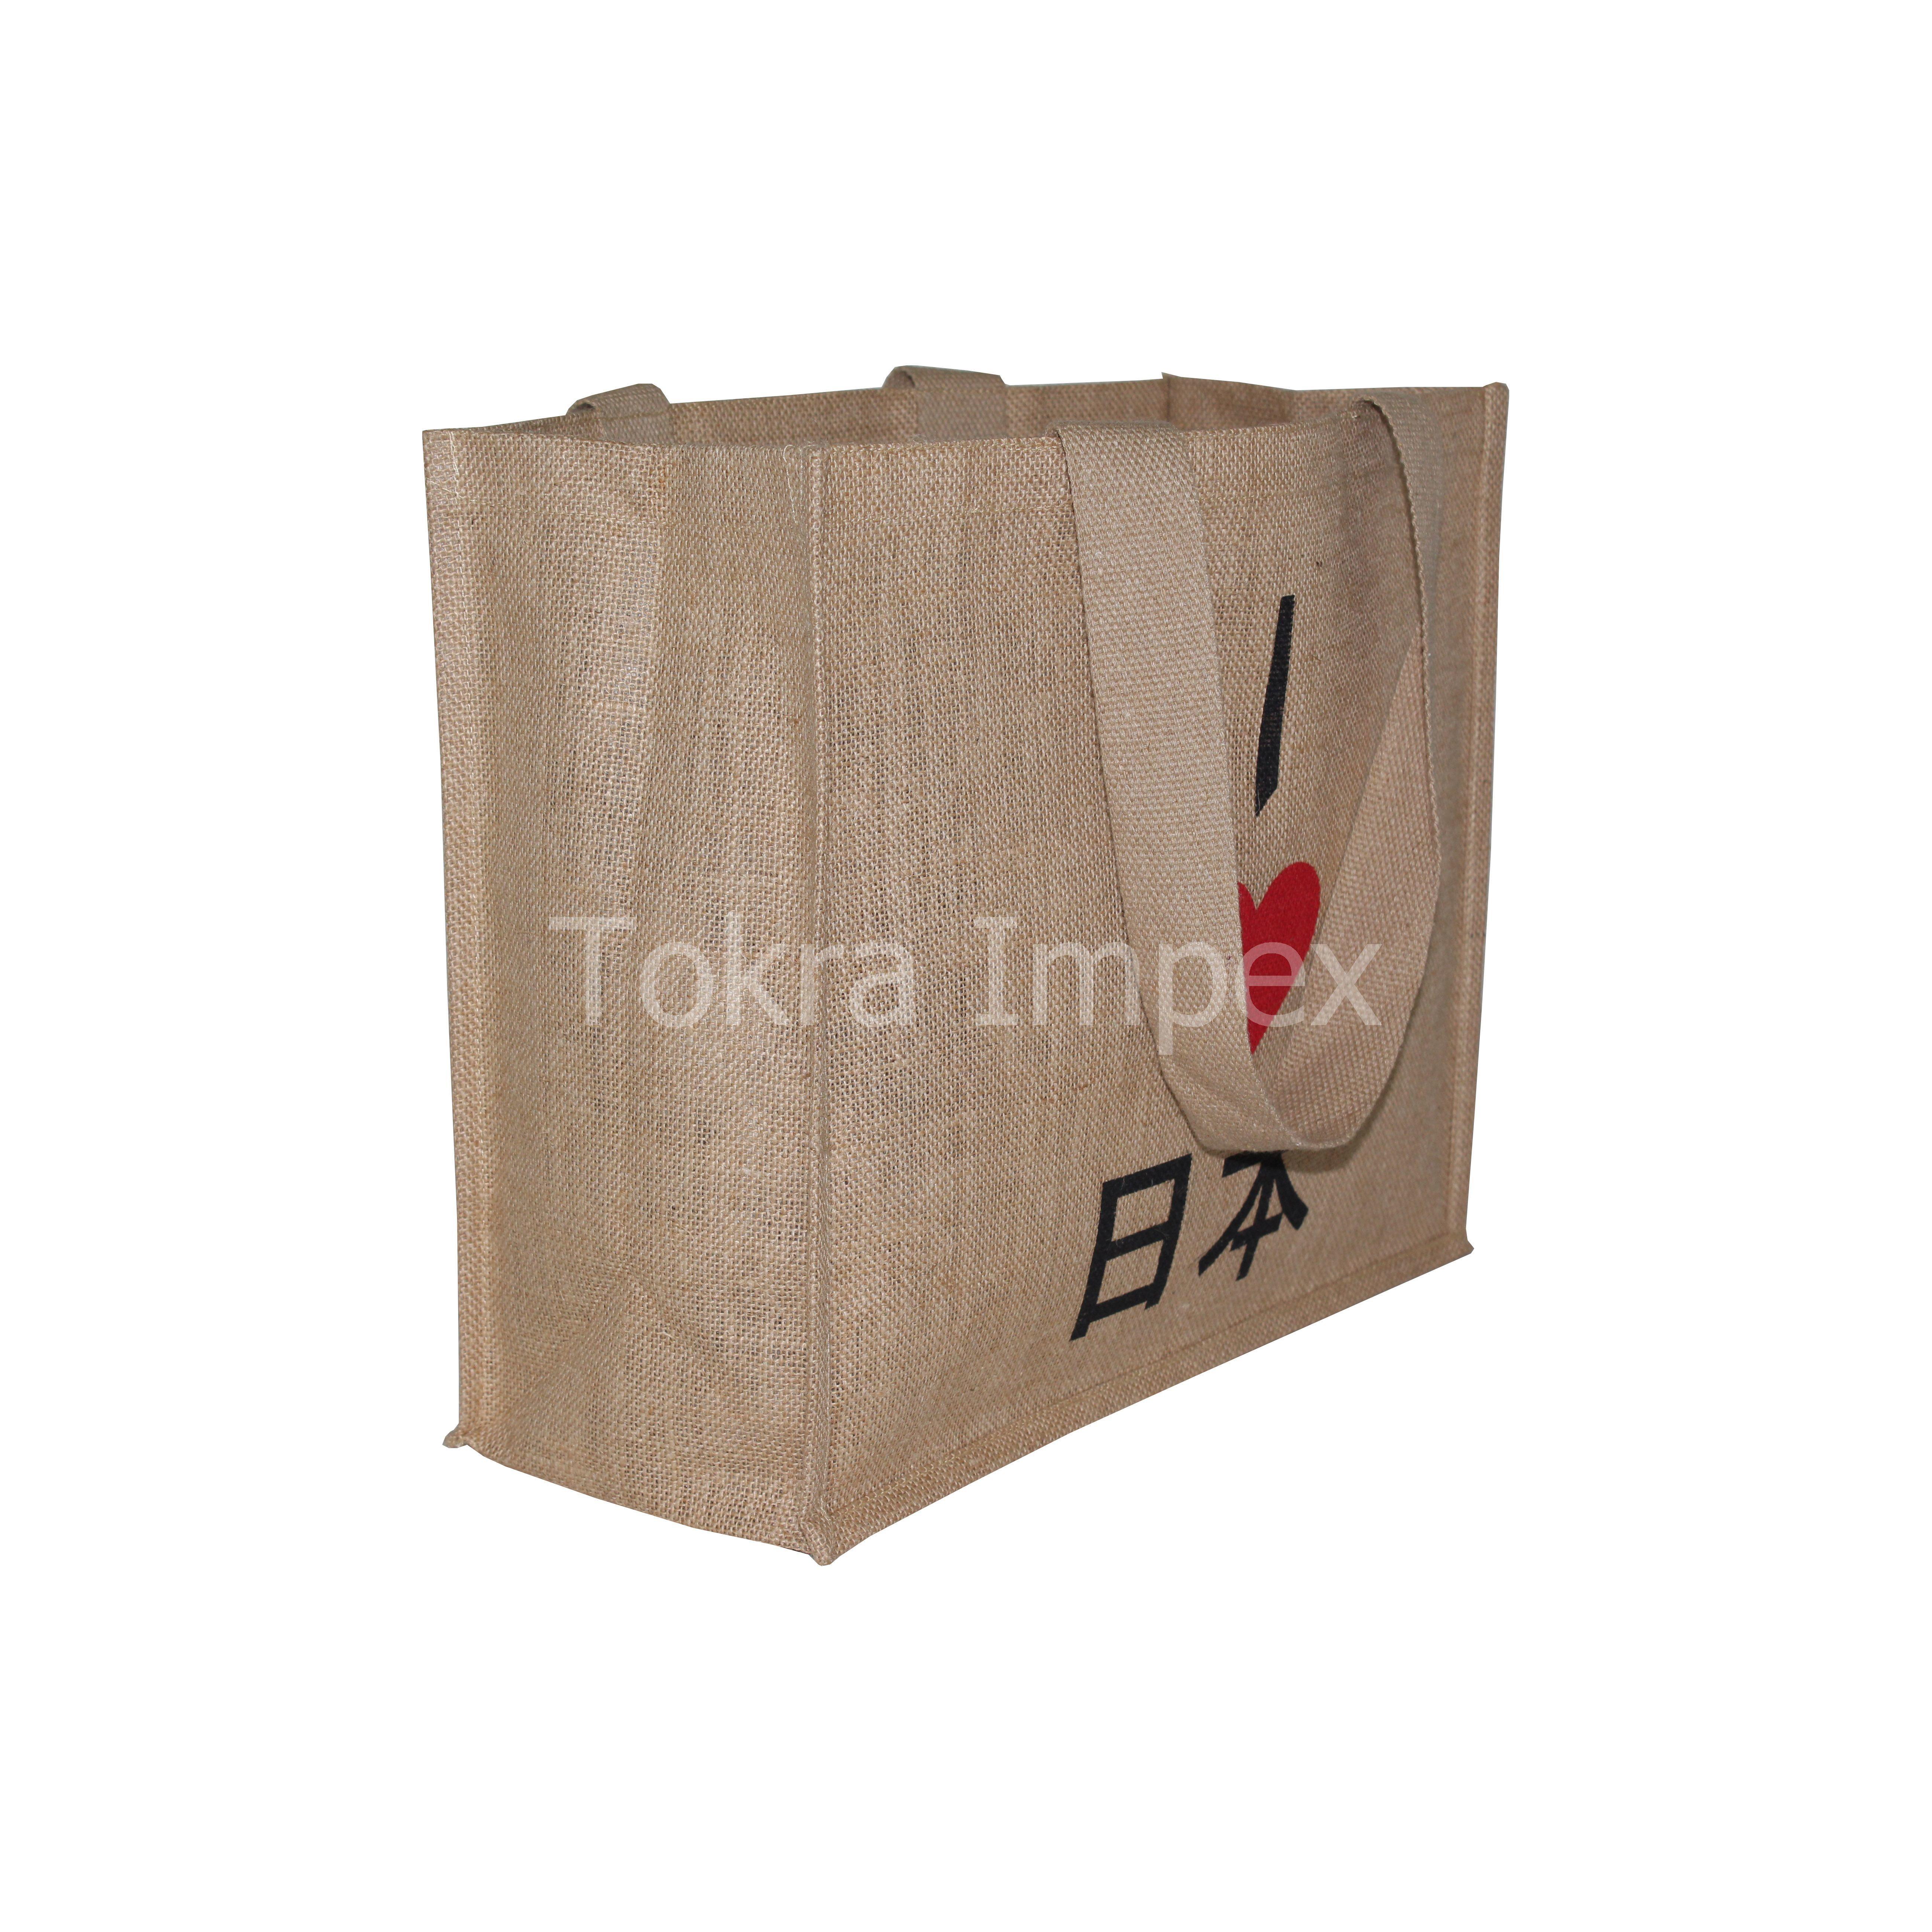 PP Laminated Jute Tote Bag With Web Handle